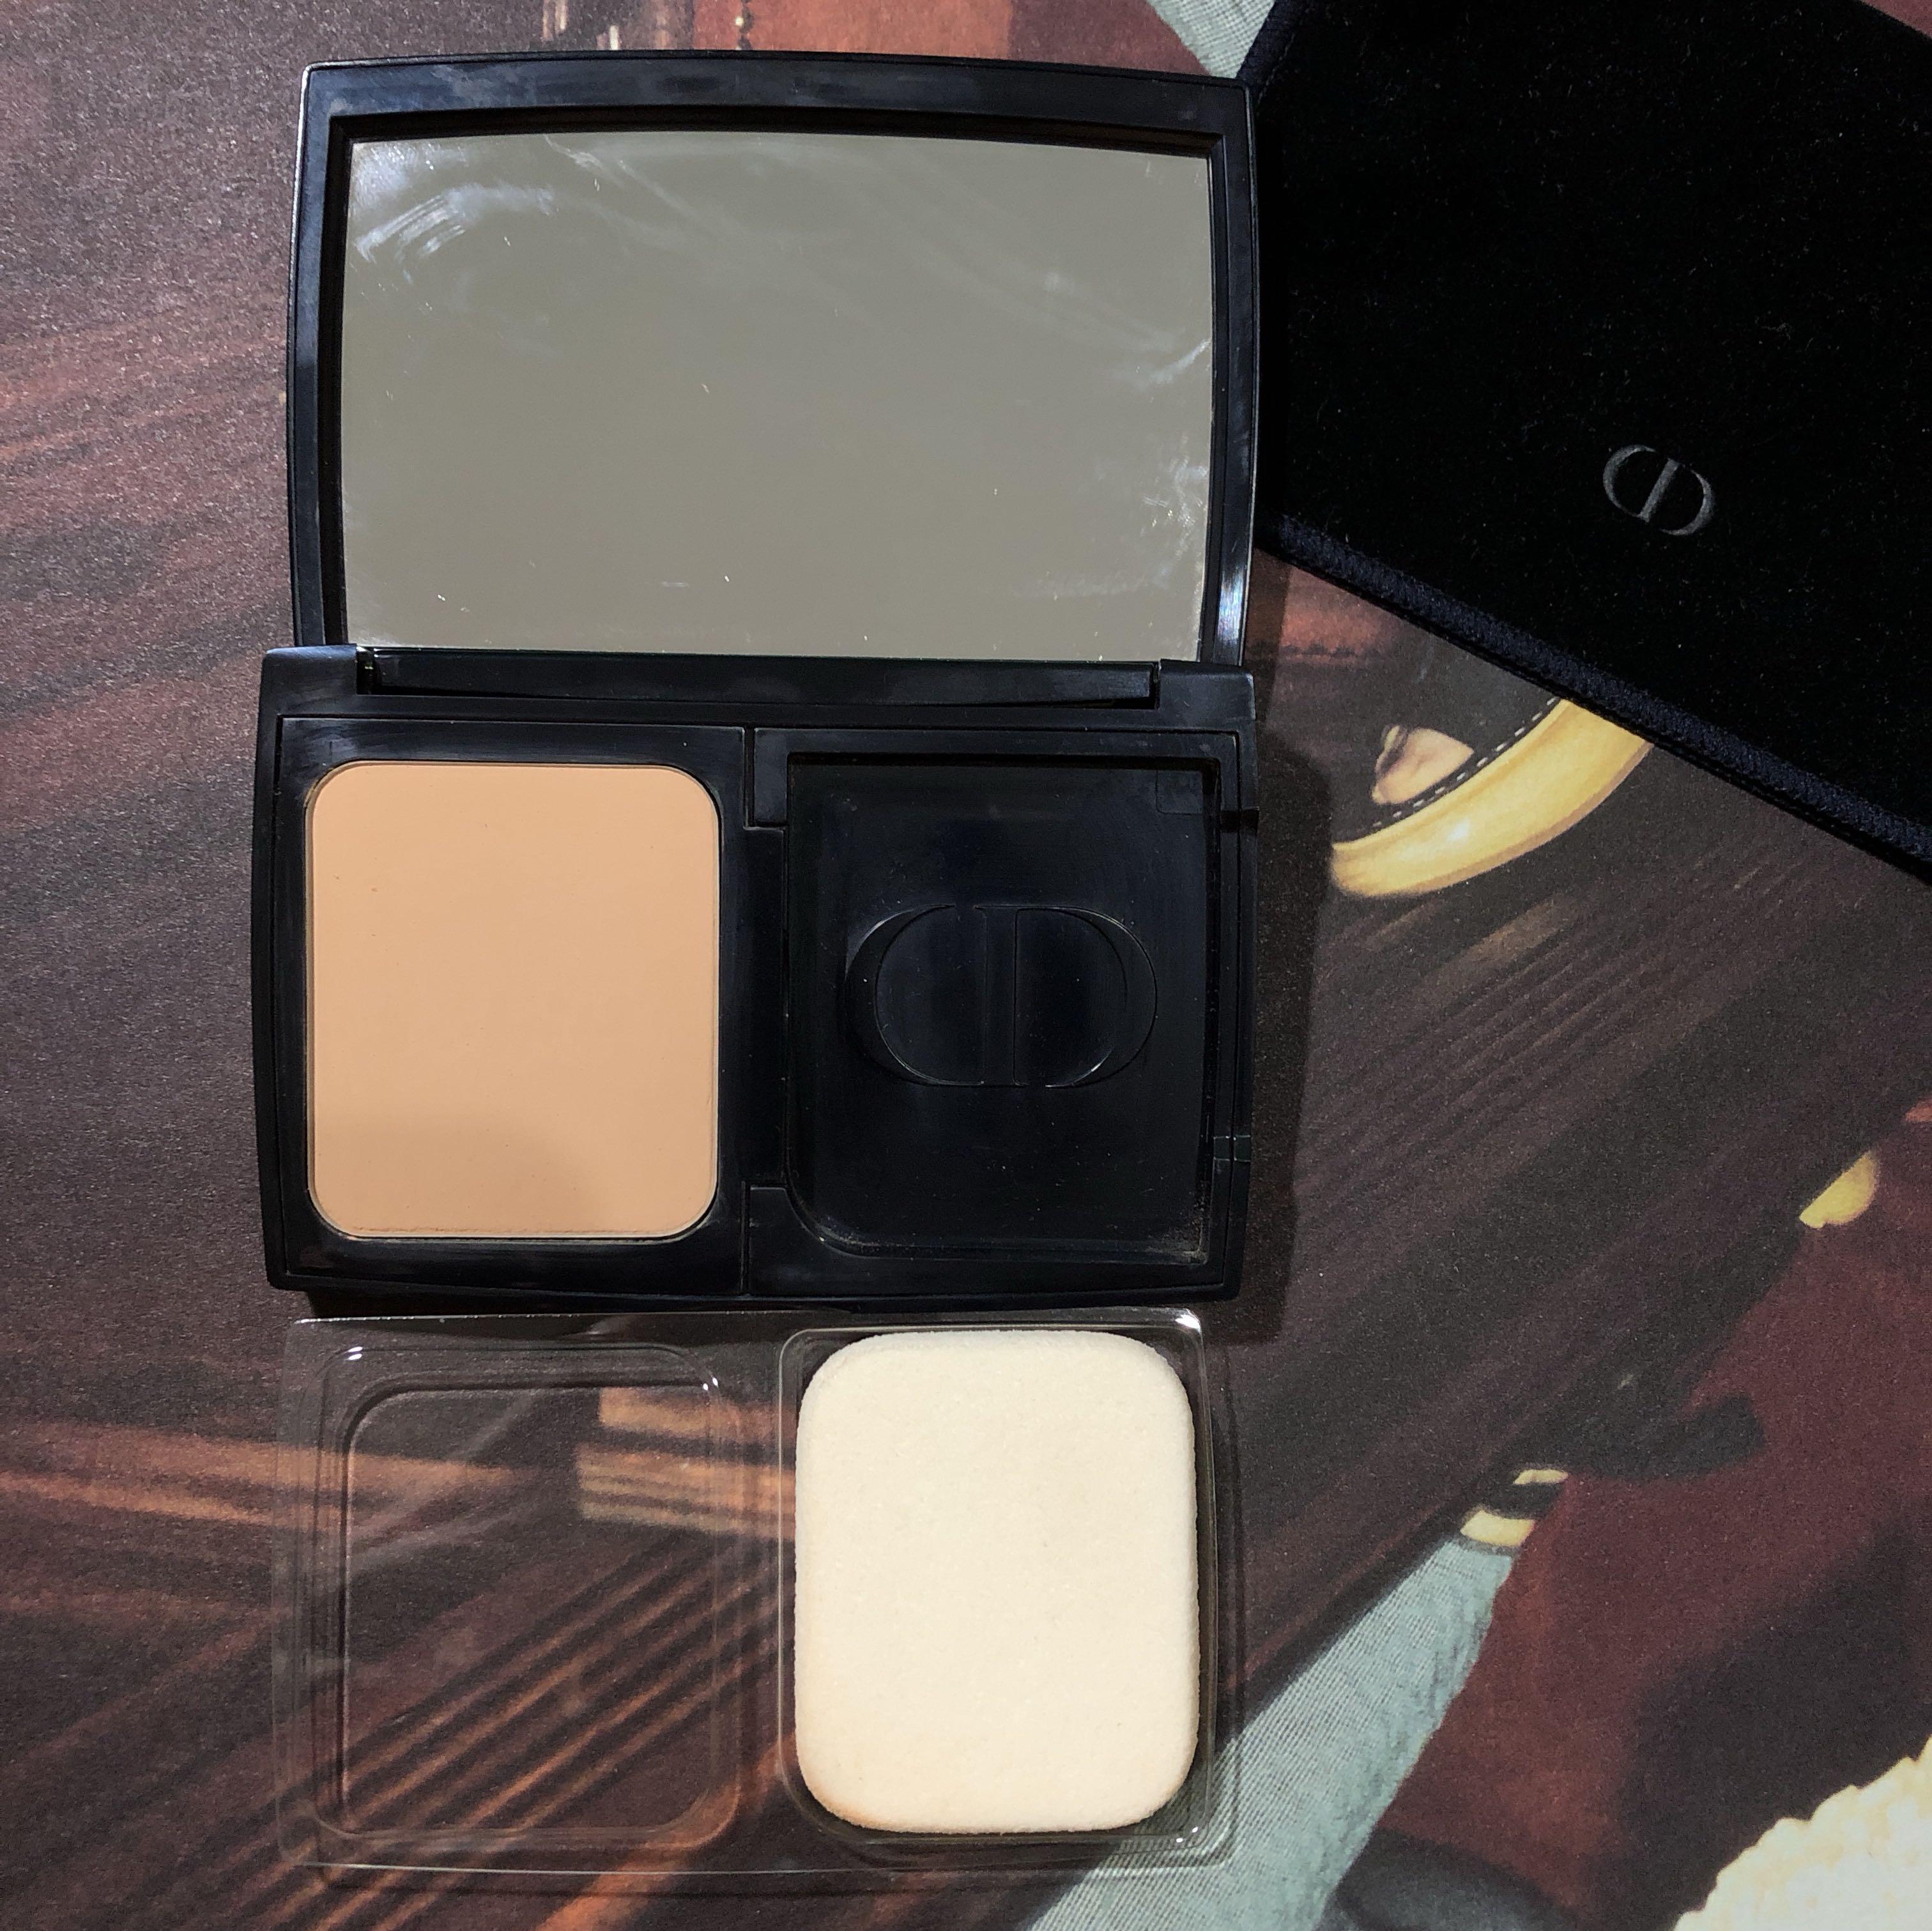 Dior Skin Forever Extreme Control Powder